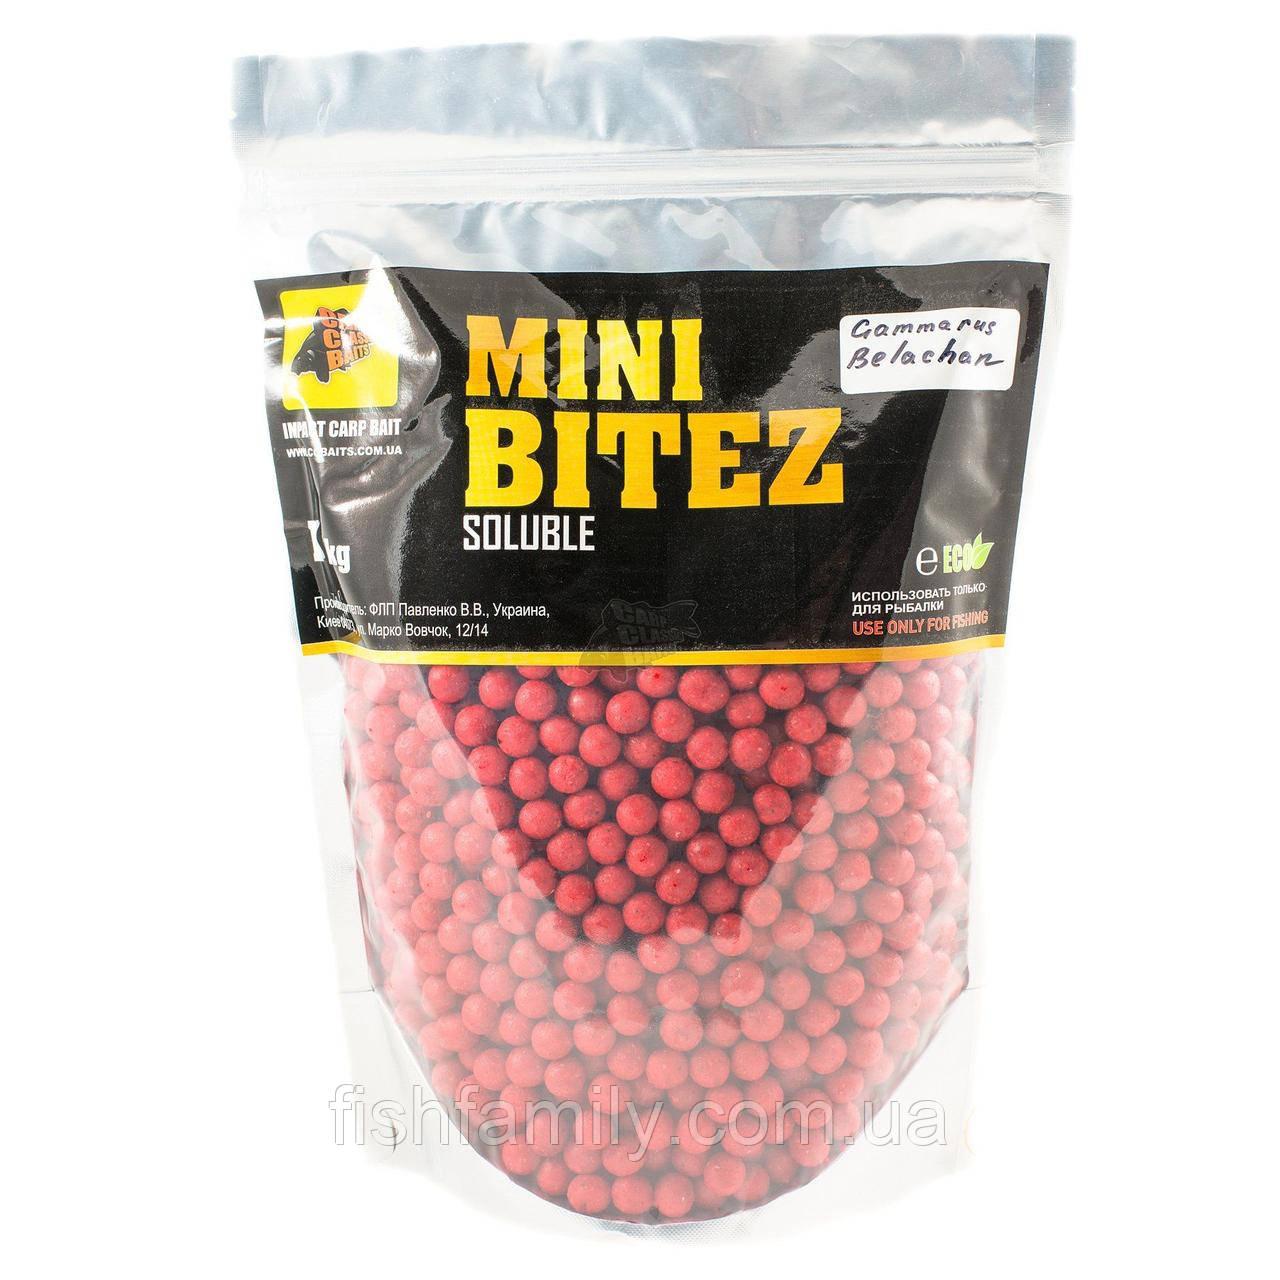 Пылящие Бойлы Mini Bitez Gammarus Belachan [Гаммарус & Белочан], 10, 1000